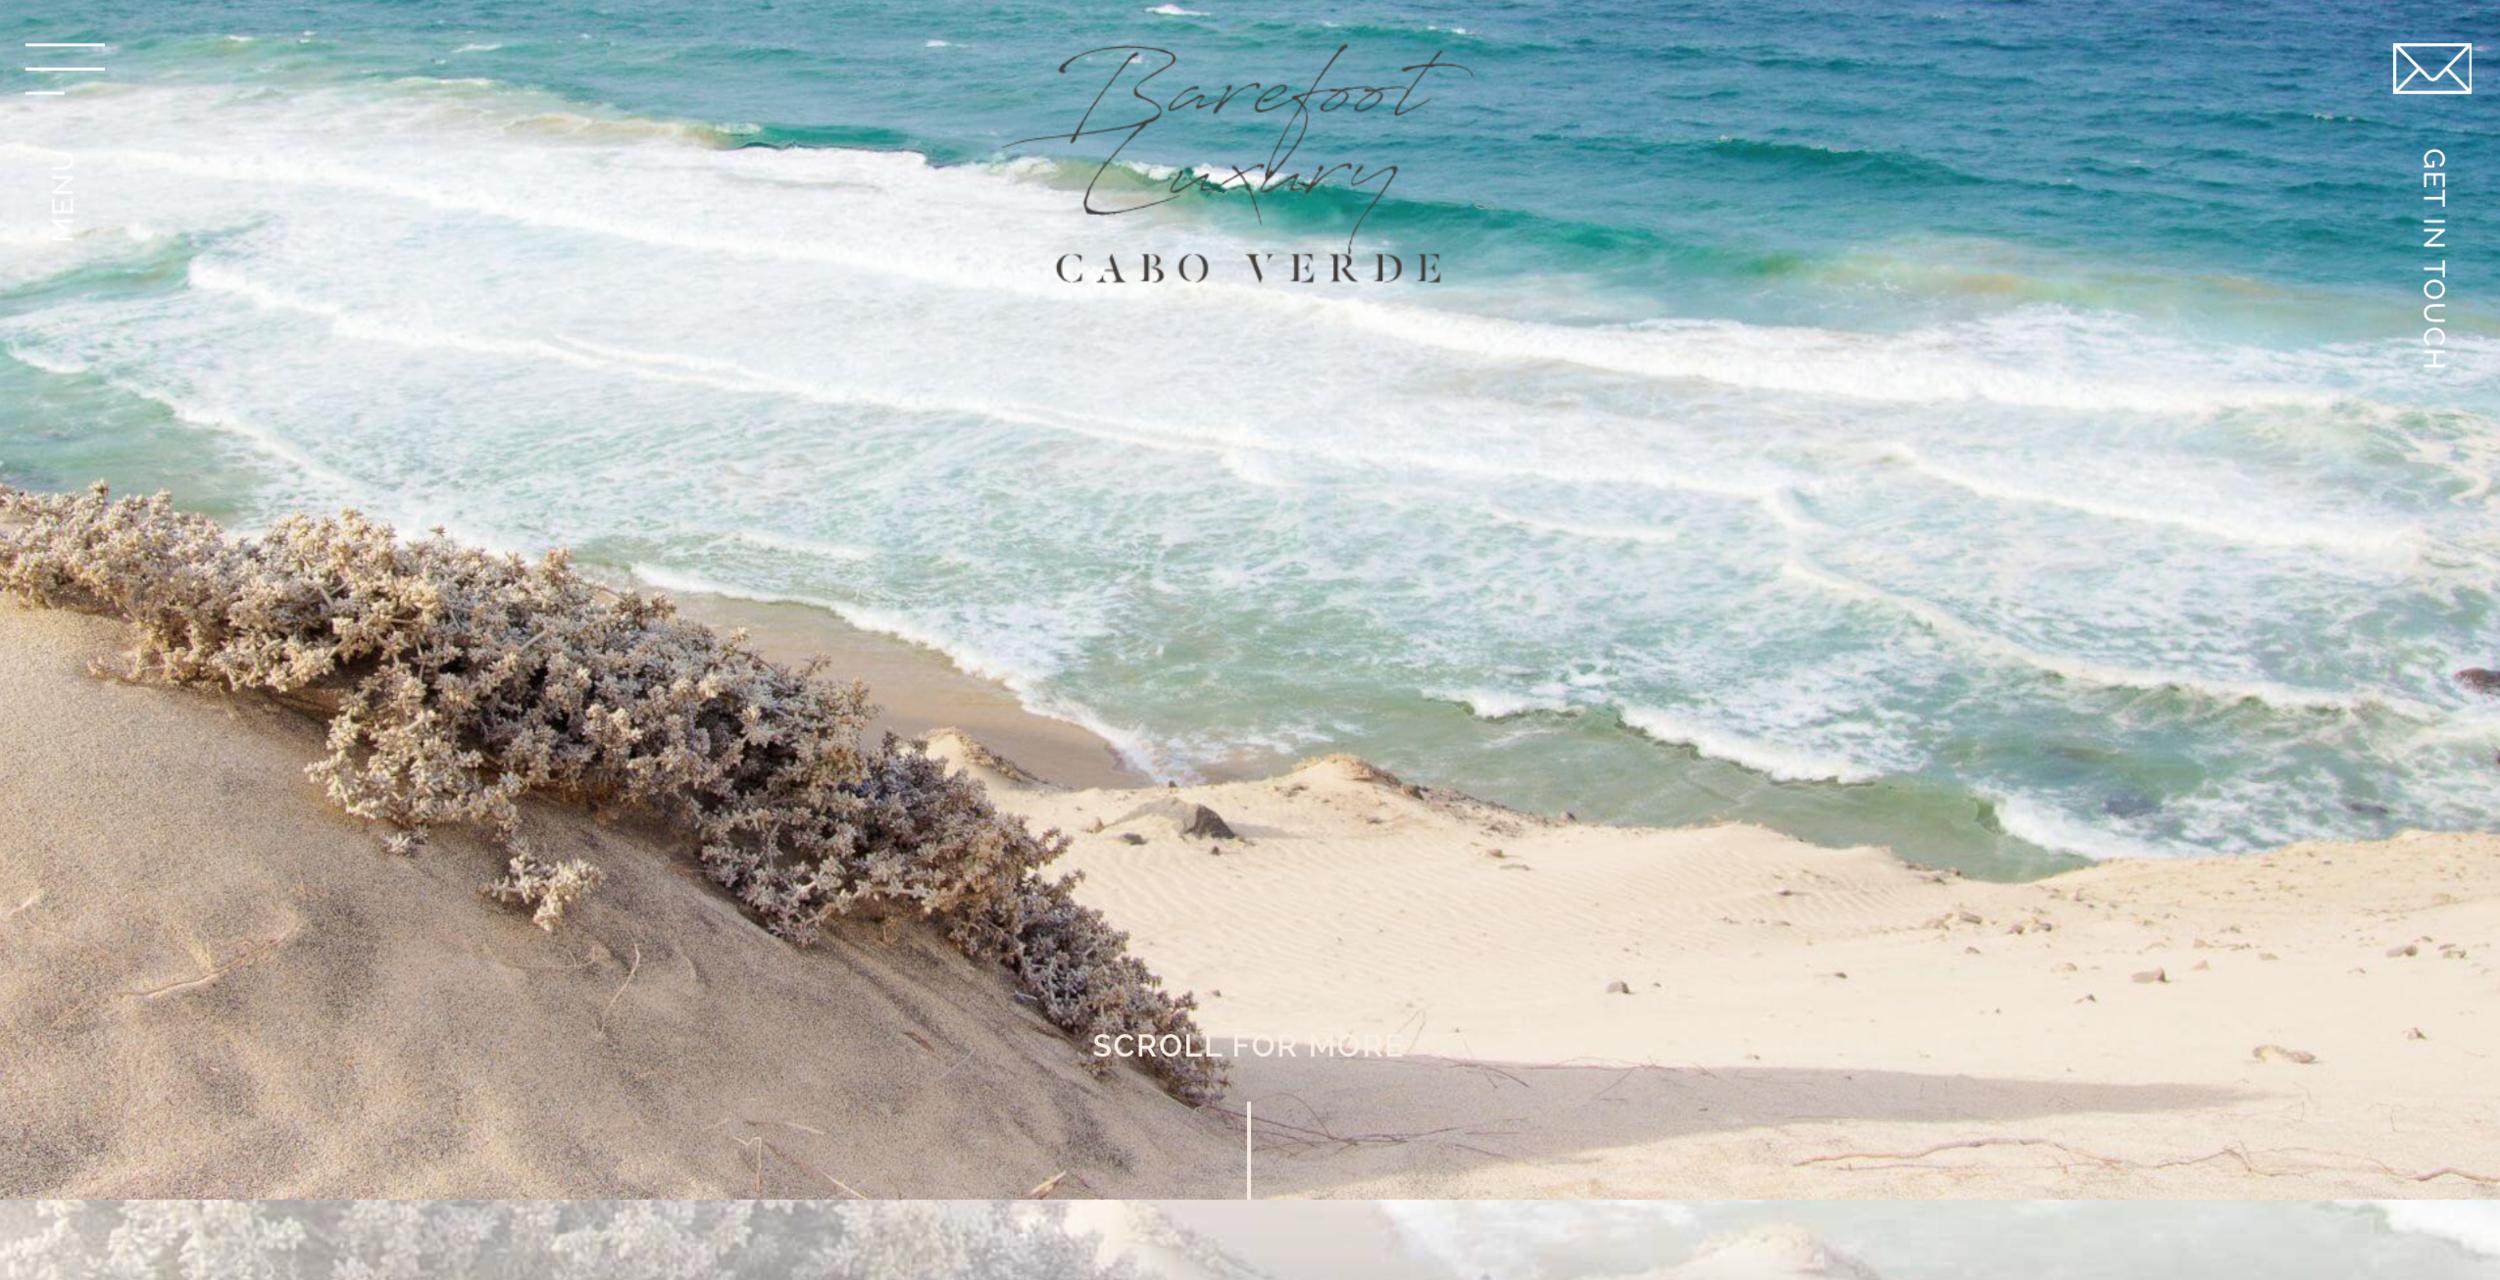 Barefoot Luxury Cabo Verde